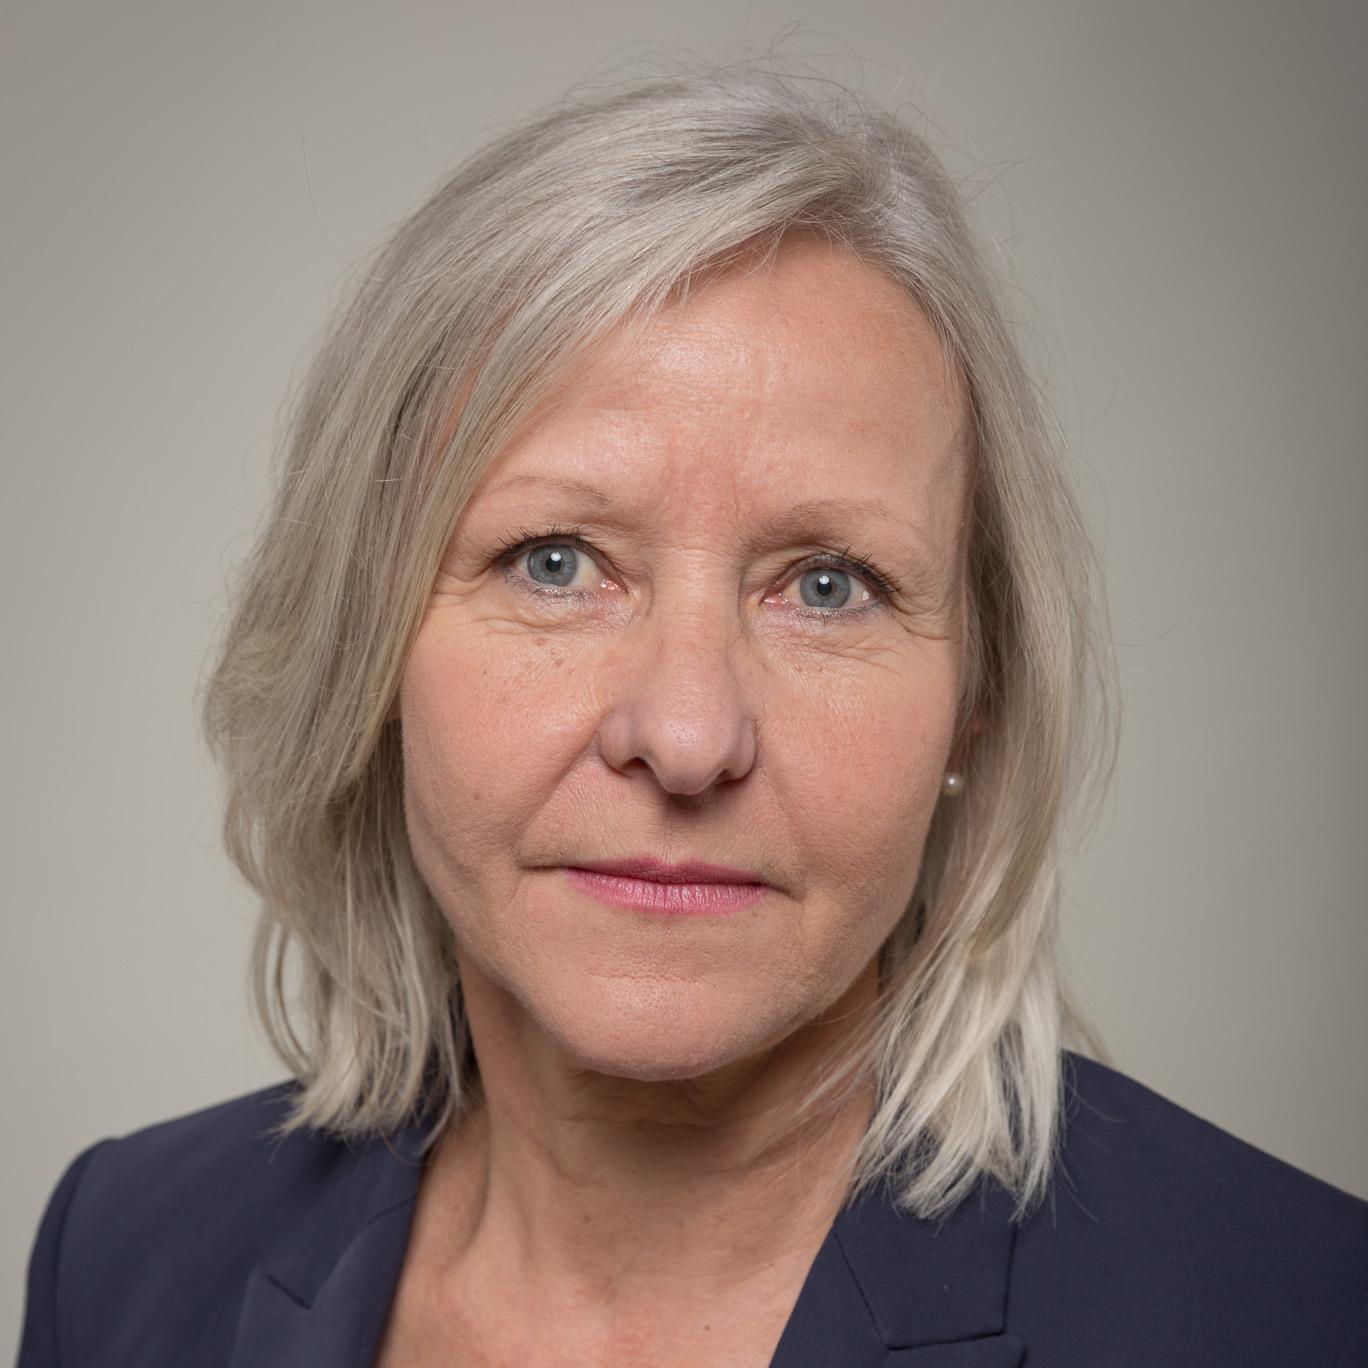 Helena Zaugg, Presidentessa dell'Associazione Svizzera Infermieri ASI